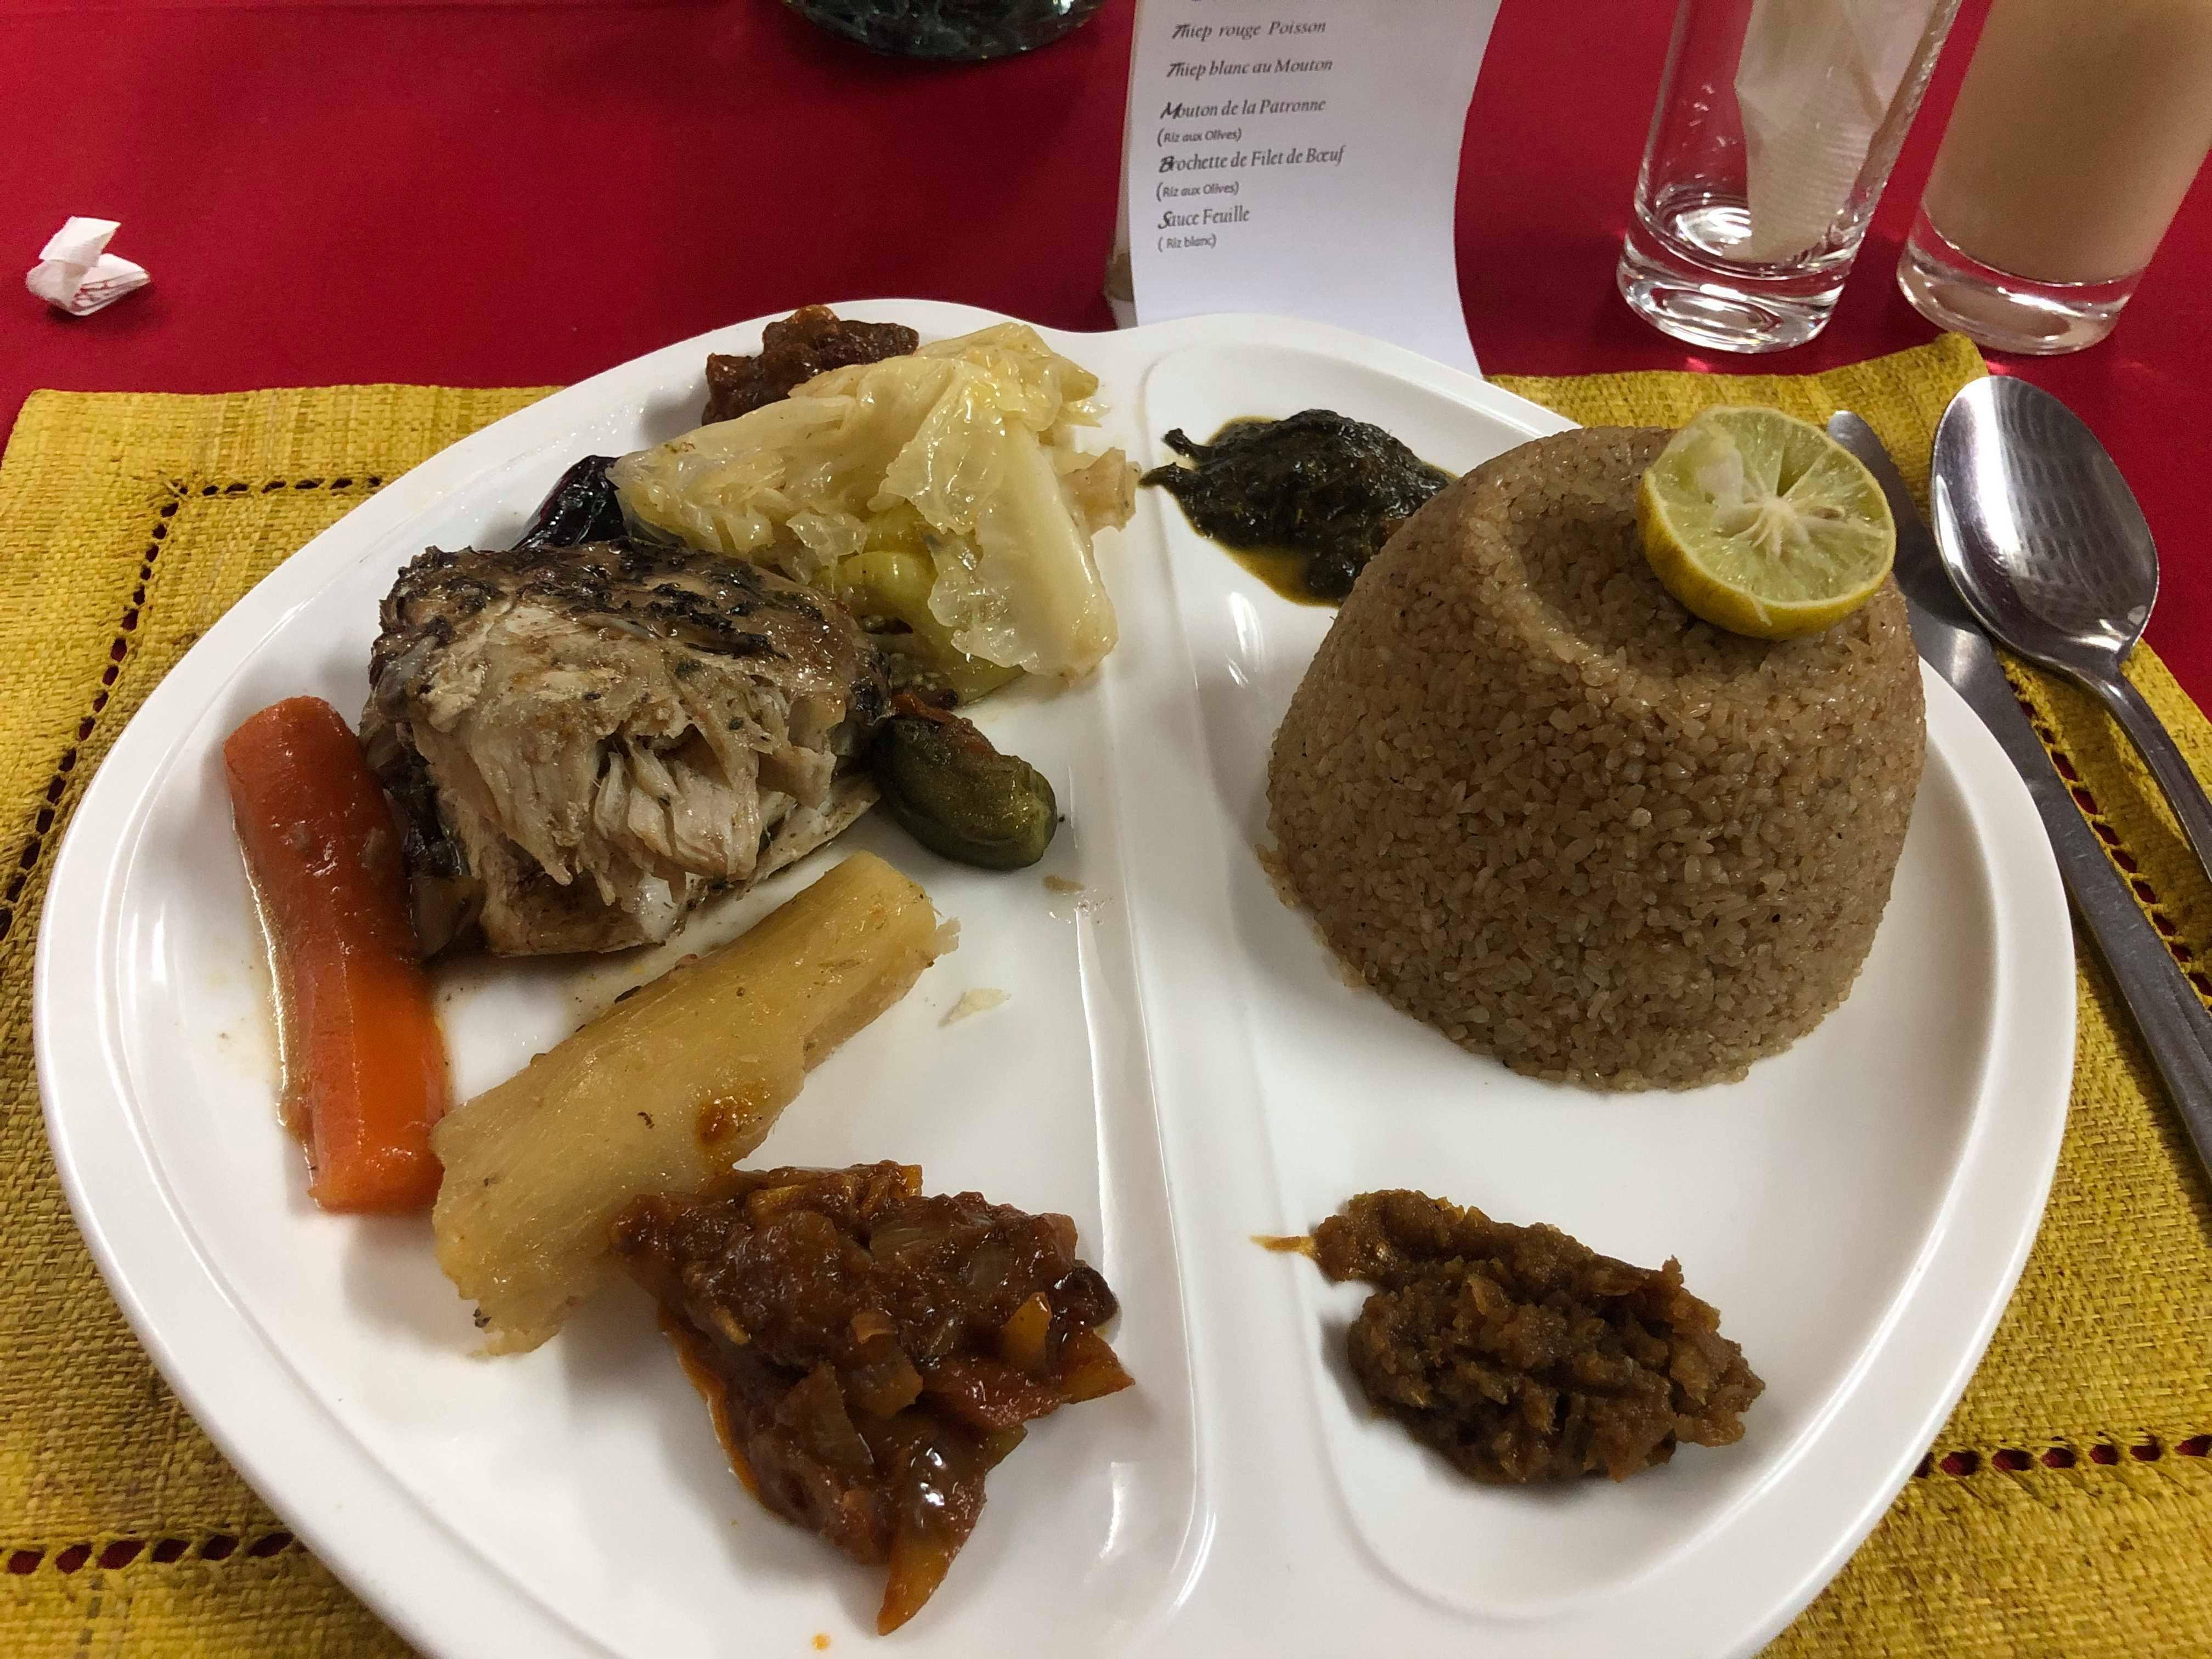 Teral, lourd moment de solitude, teral, cuisine sénégalaise Abidjan, serialfoodie, critique culinaire